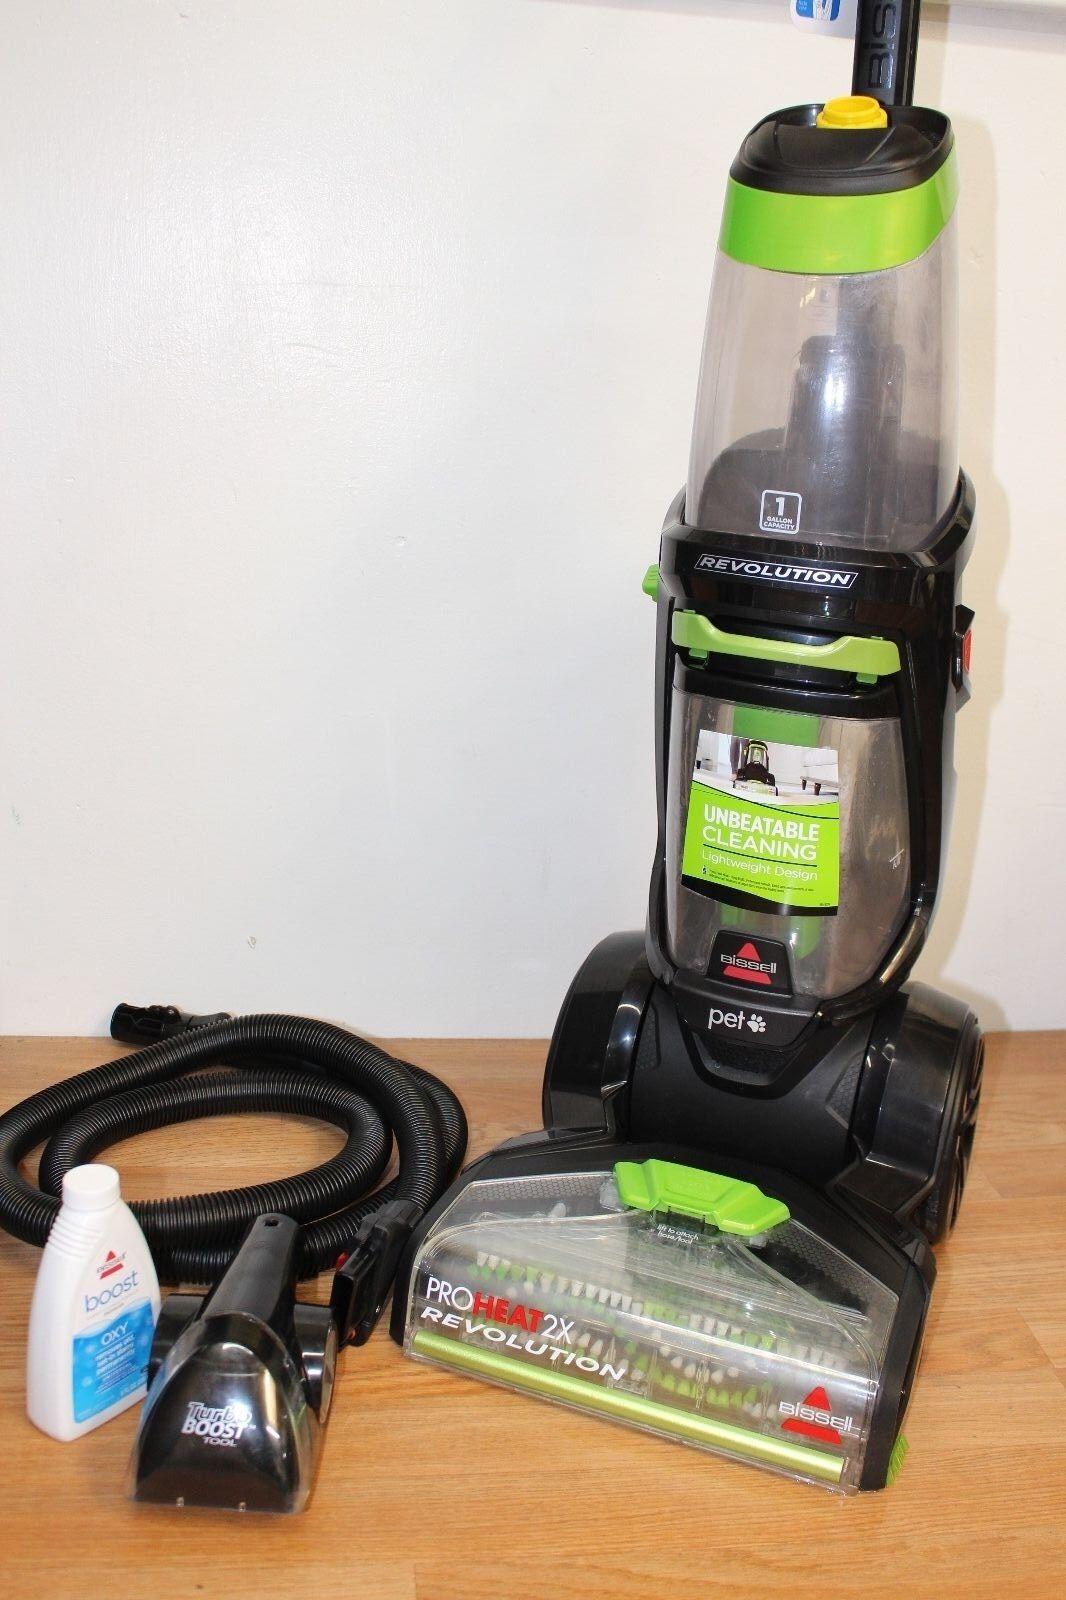 carpet shampooer bissell 1548p revolution pet fullsize carpet cleaner pet vacuum - Bissell Pet Carpet Cleaner